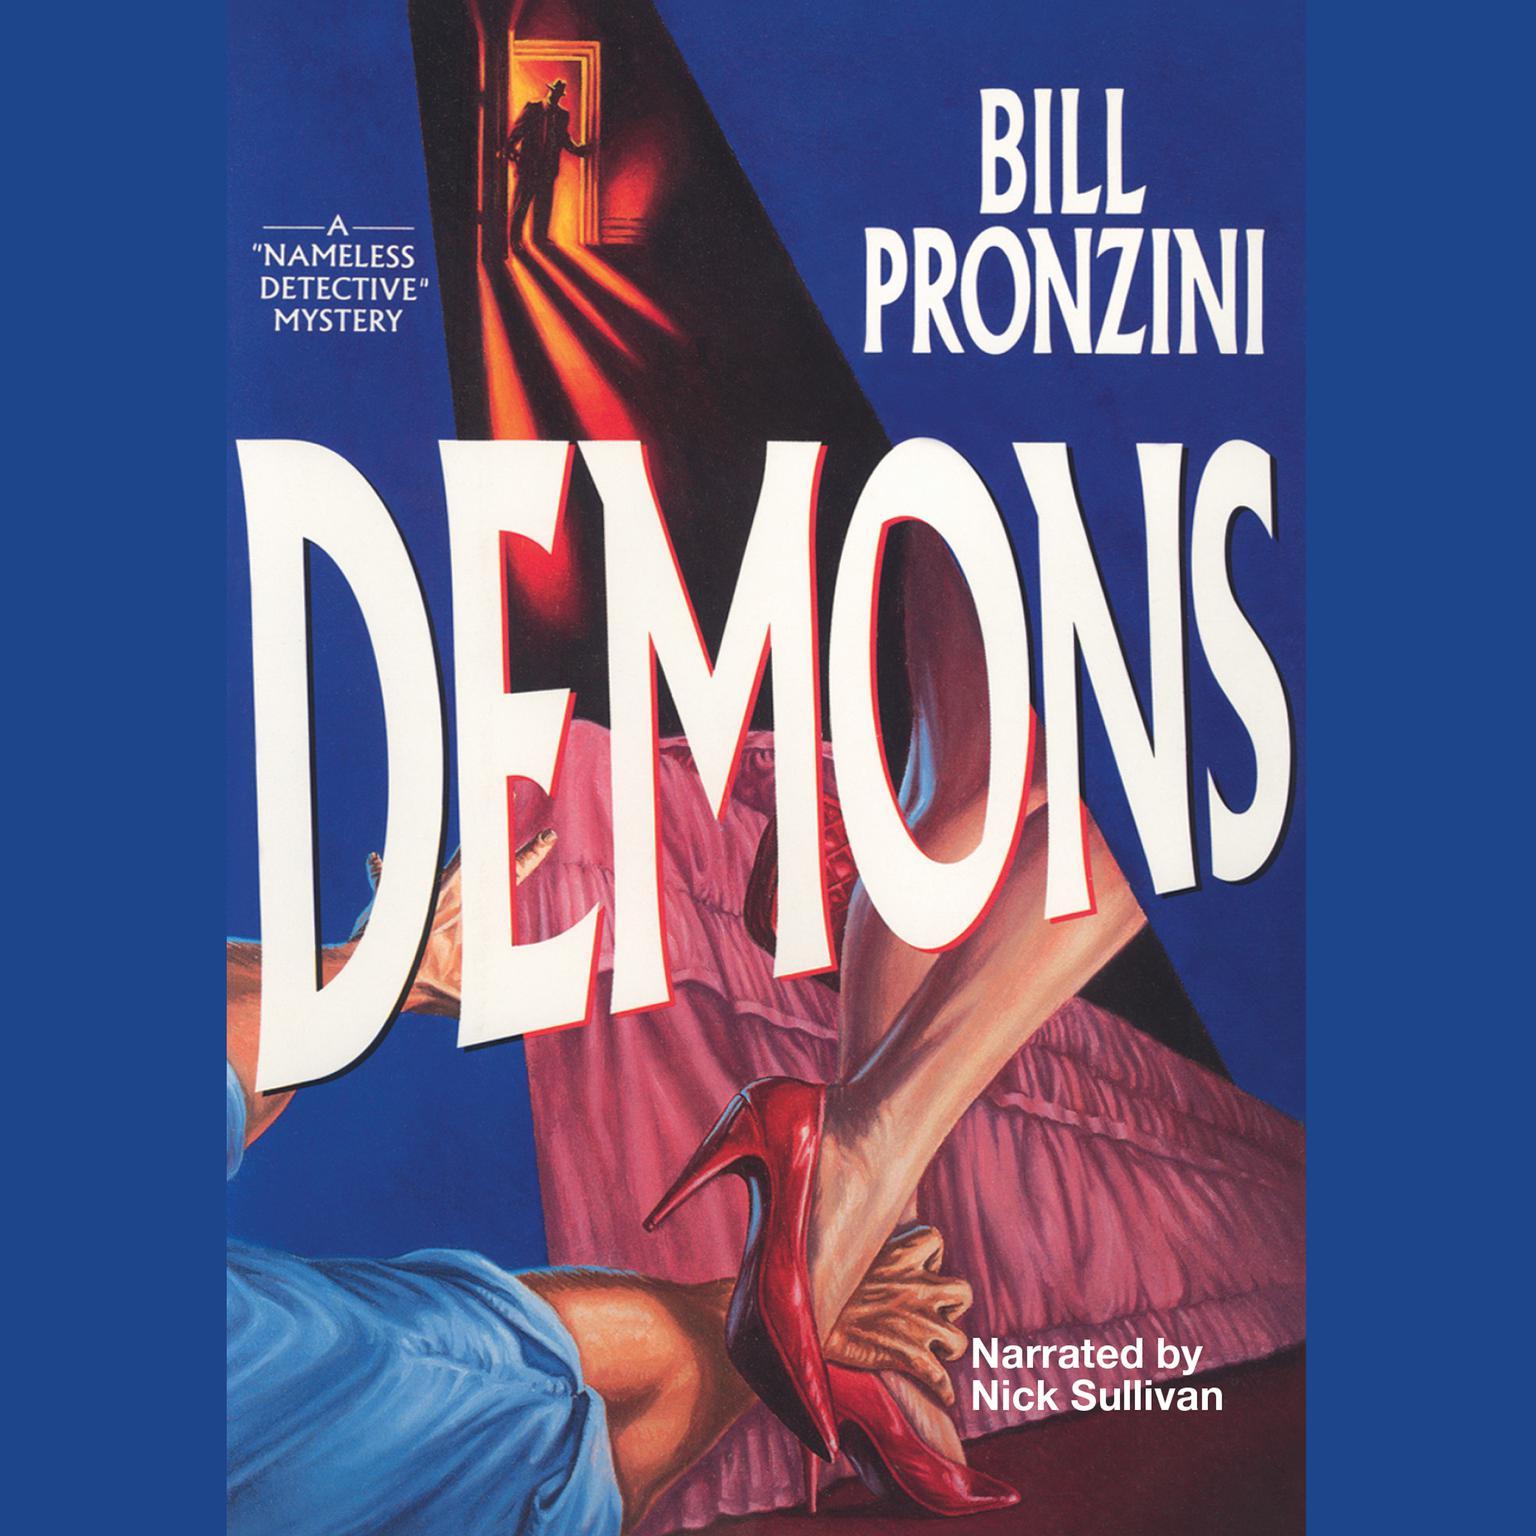 Demons: A Nameless Detective Mystery Audiobook, by Bill Pronzini